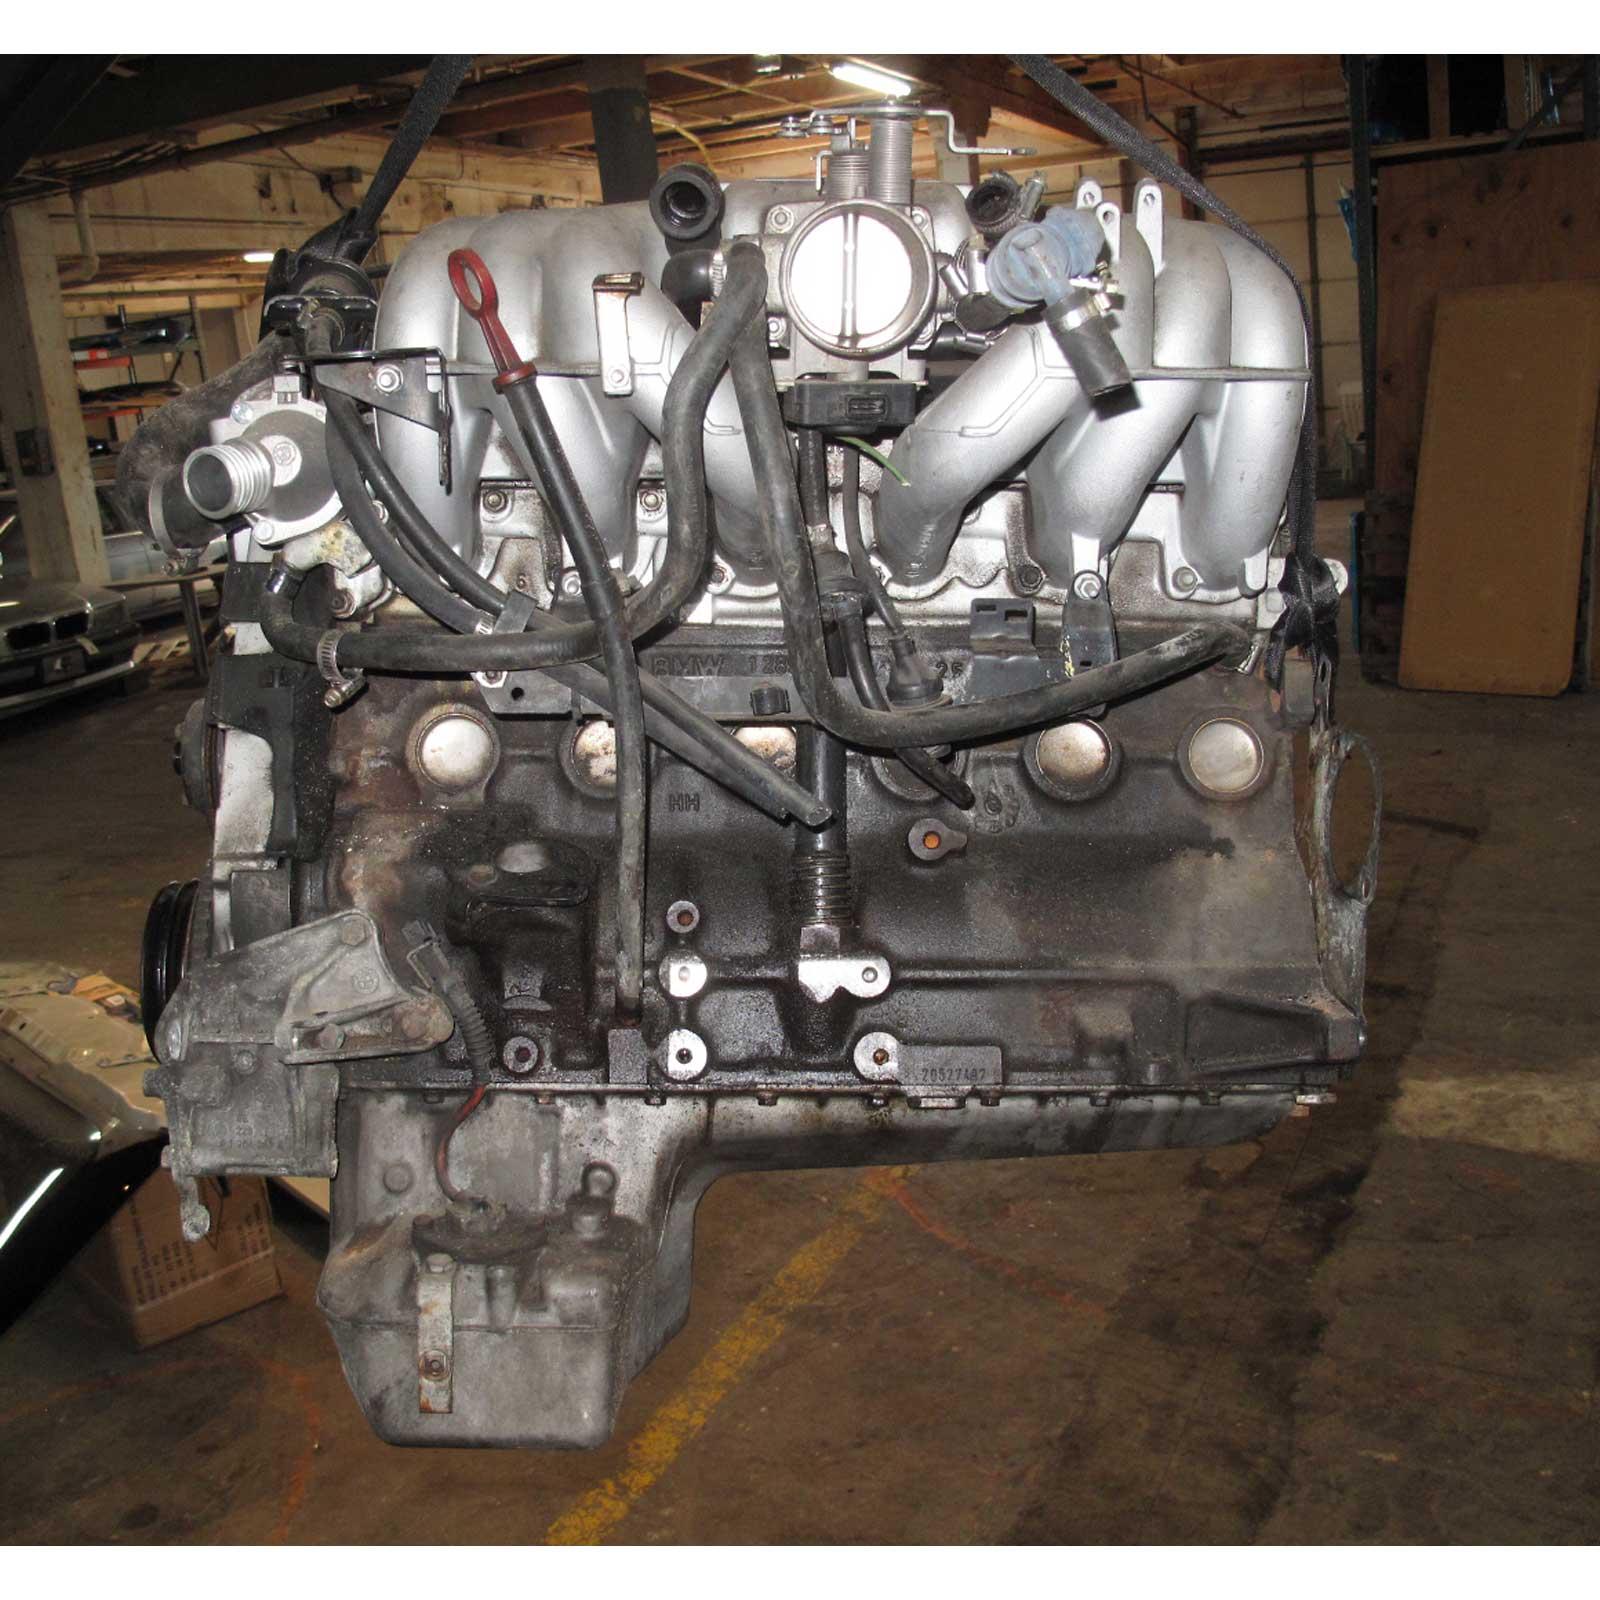 1987 e30 325i engine diagram bmw e30 325i m20 2.5l 6-cylinder engine assembly long ... #12